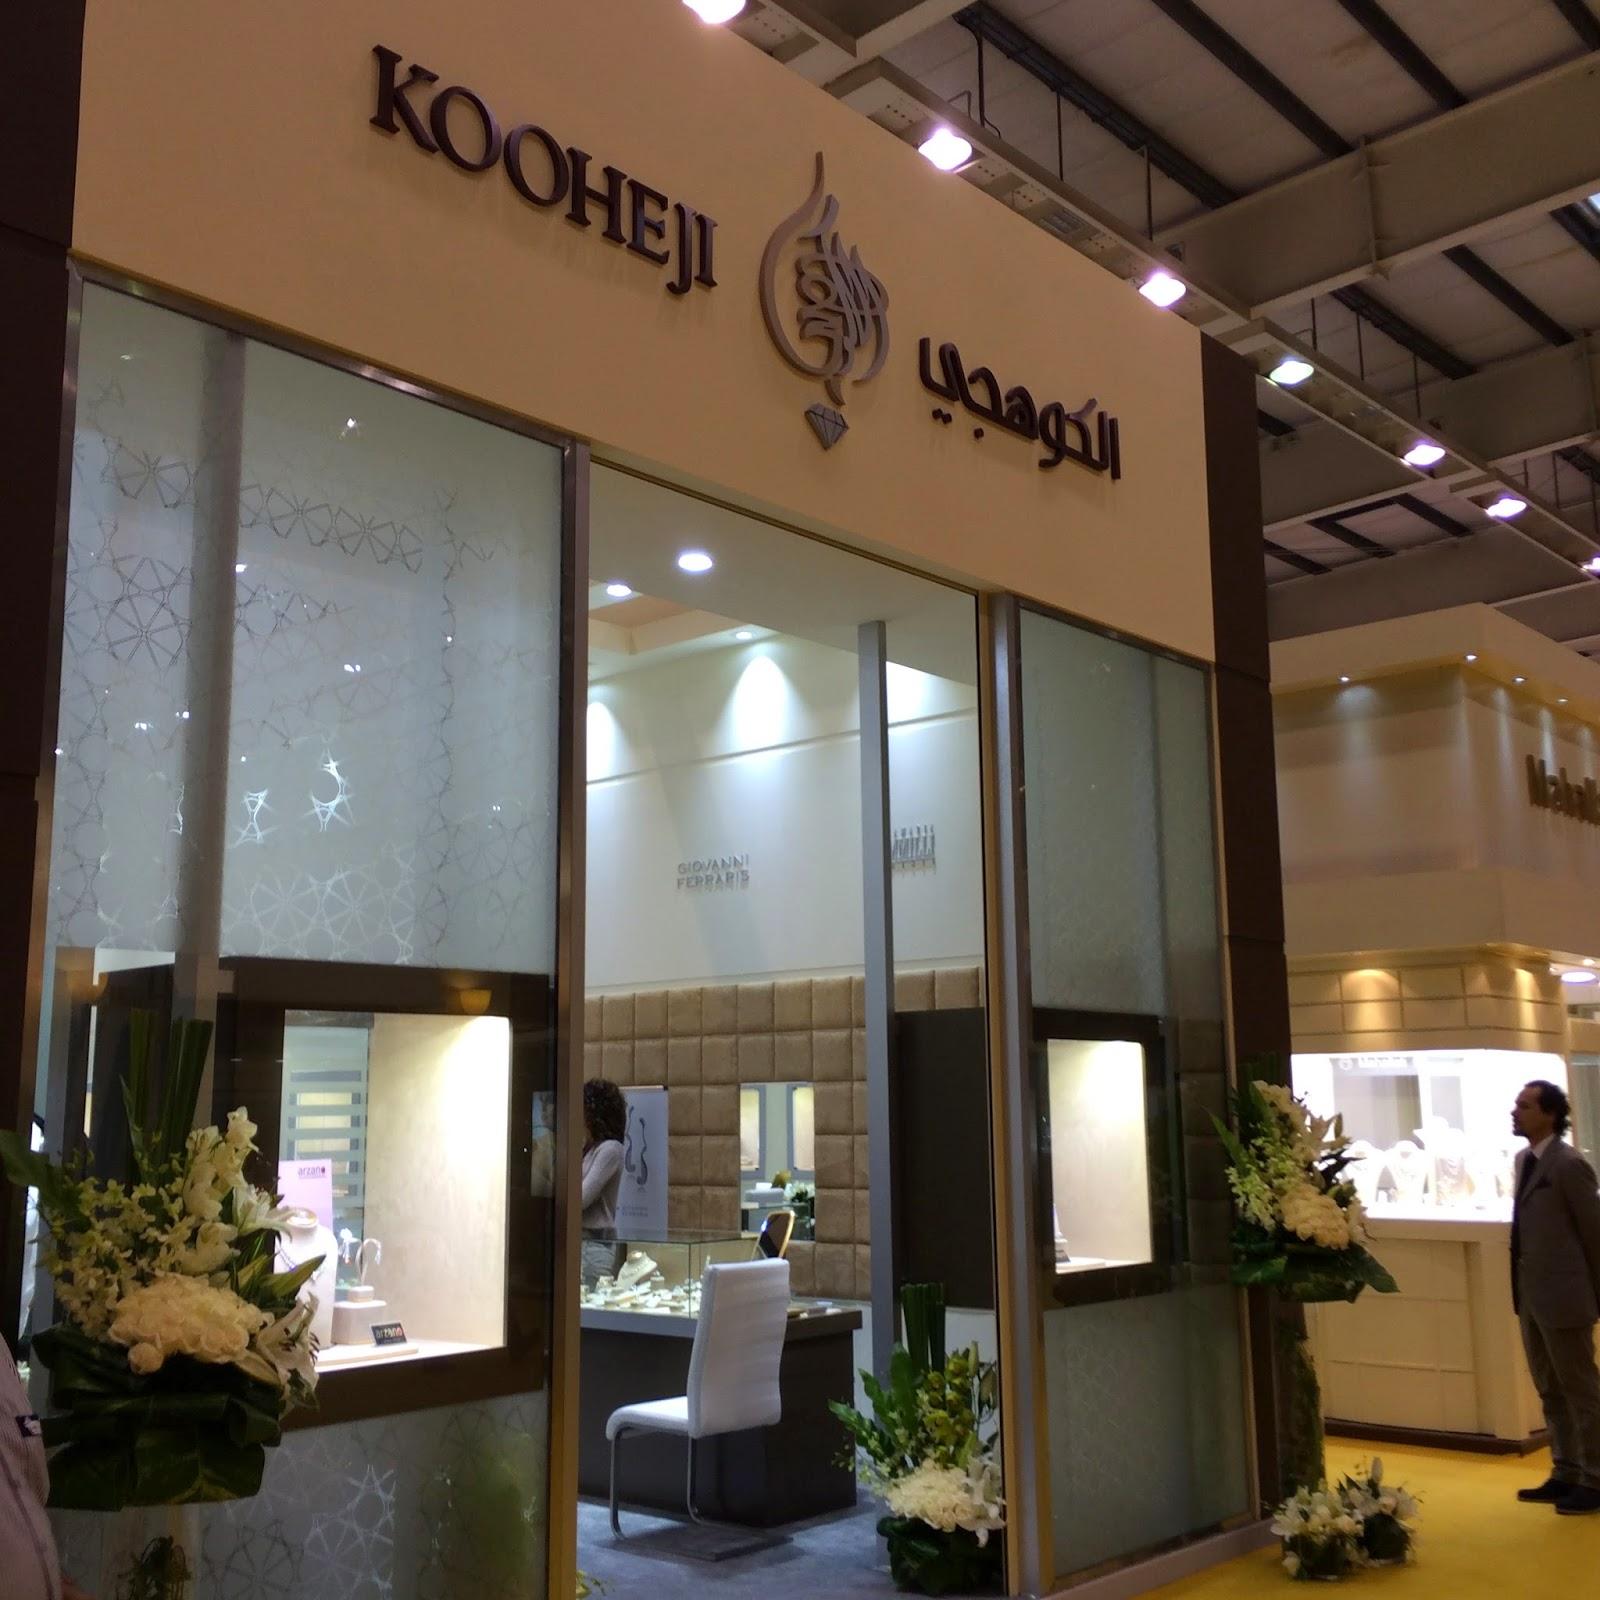 008b6a9a05491 Kooheji Jewelry At Jewelry Arabia 2014 exhibition in Bahrain تغطية مجوهرات  الكوهجي بمعرض الجواهر العربية في البحرين